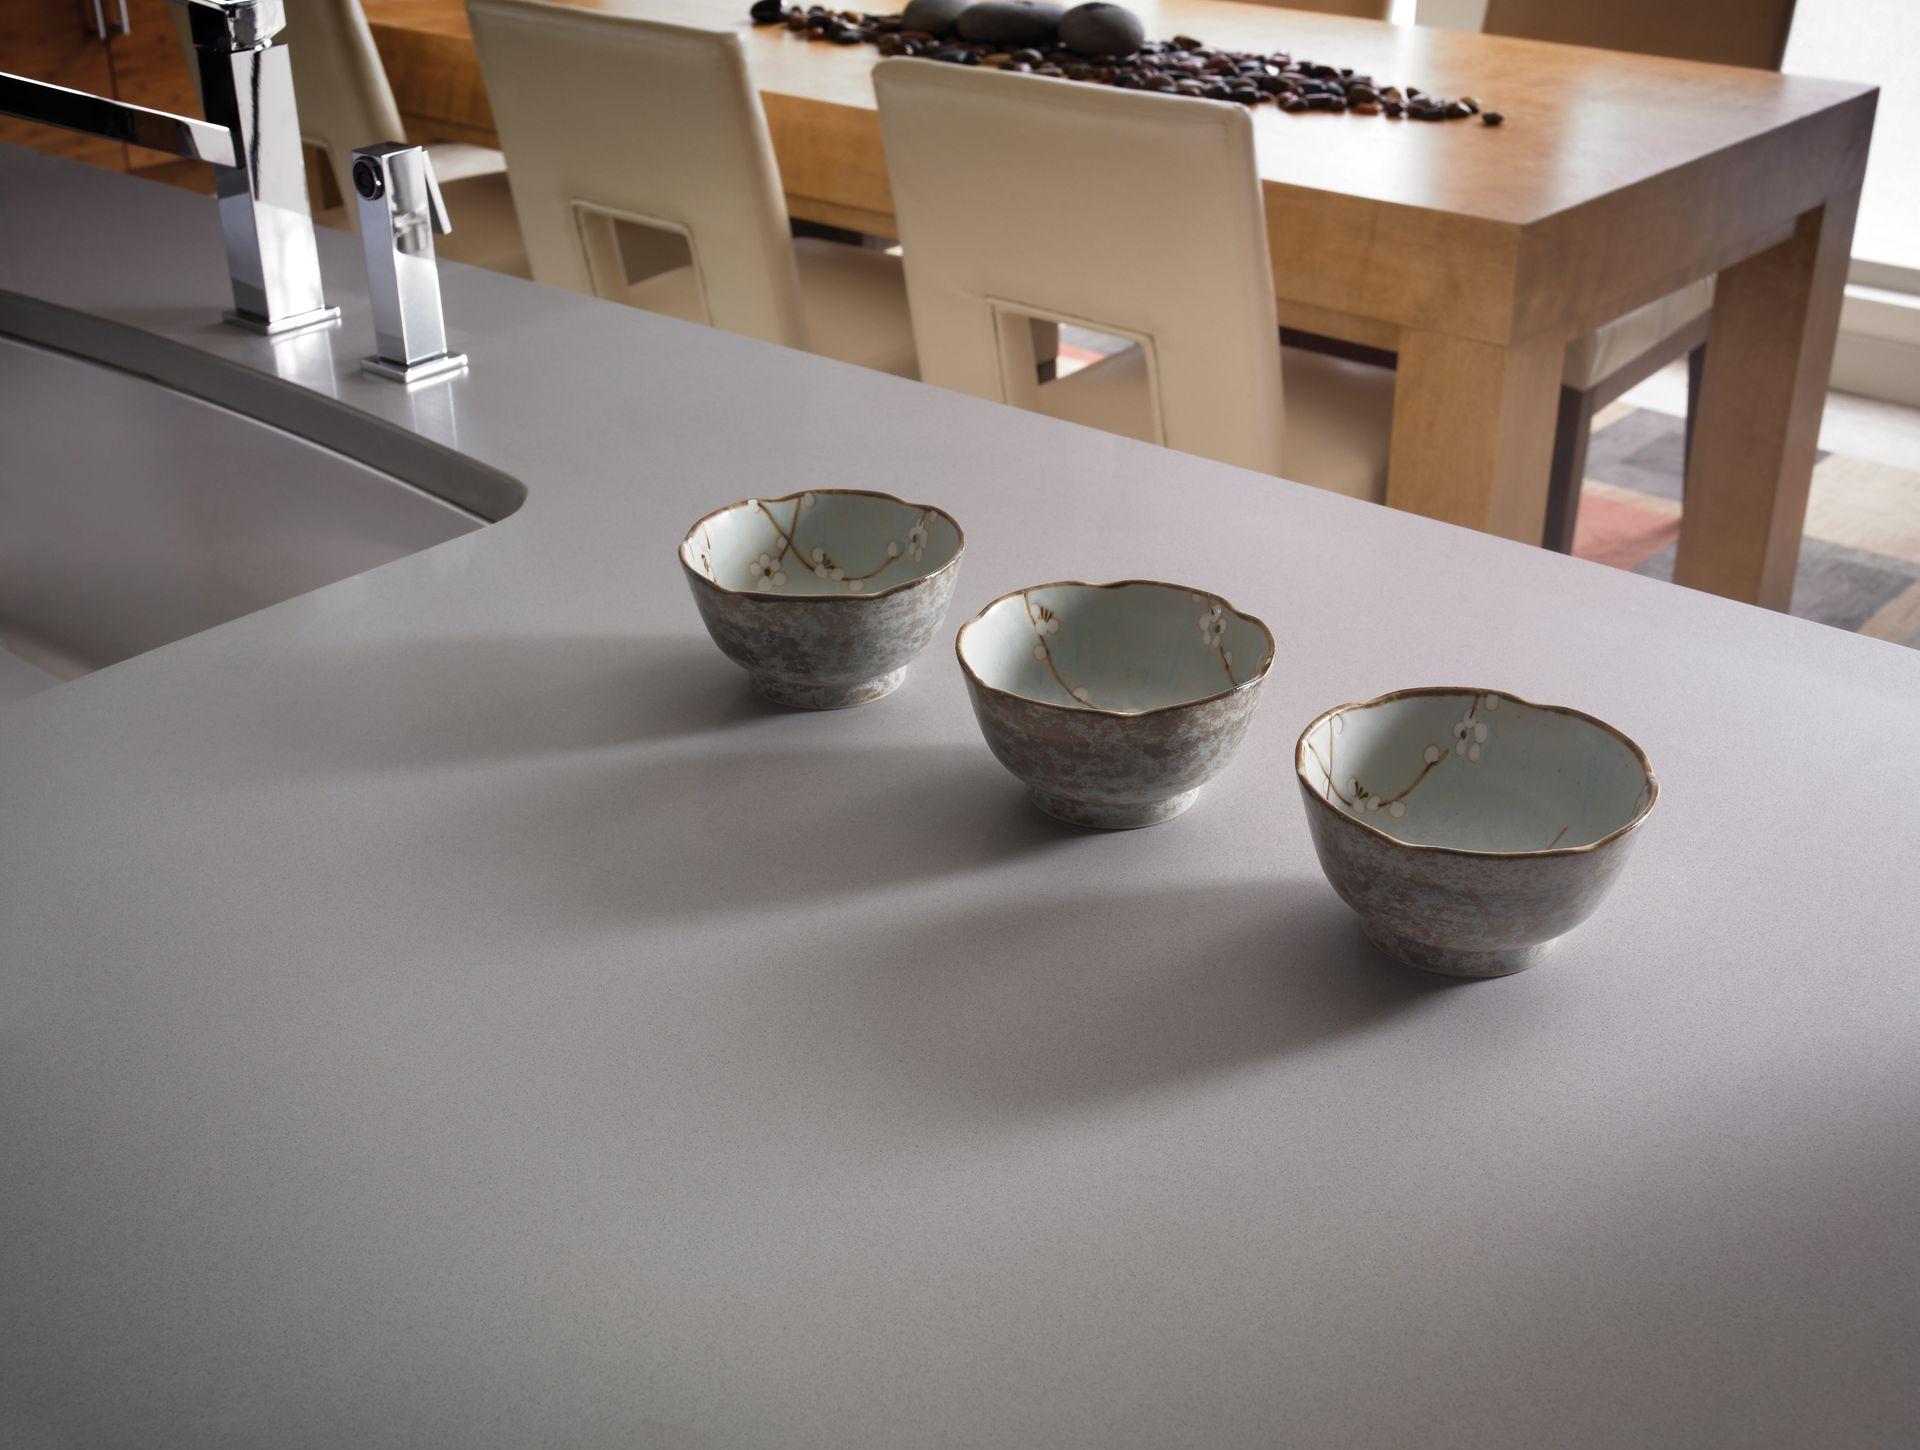 keramik-arbeitsplatte-stone4you